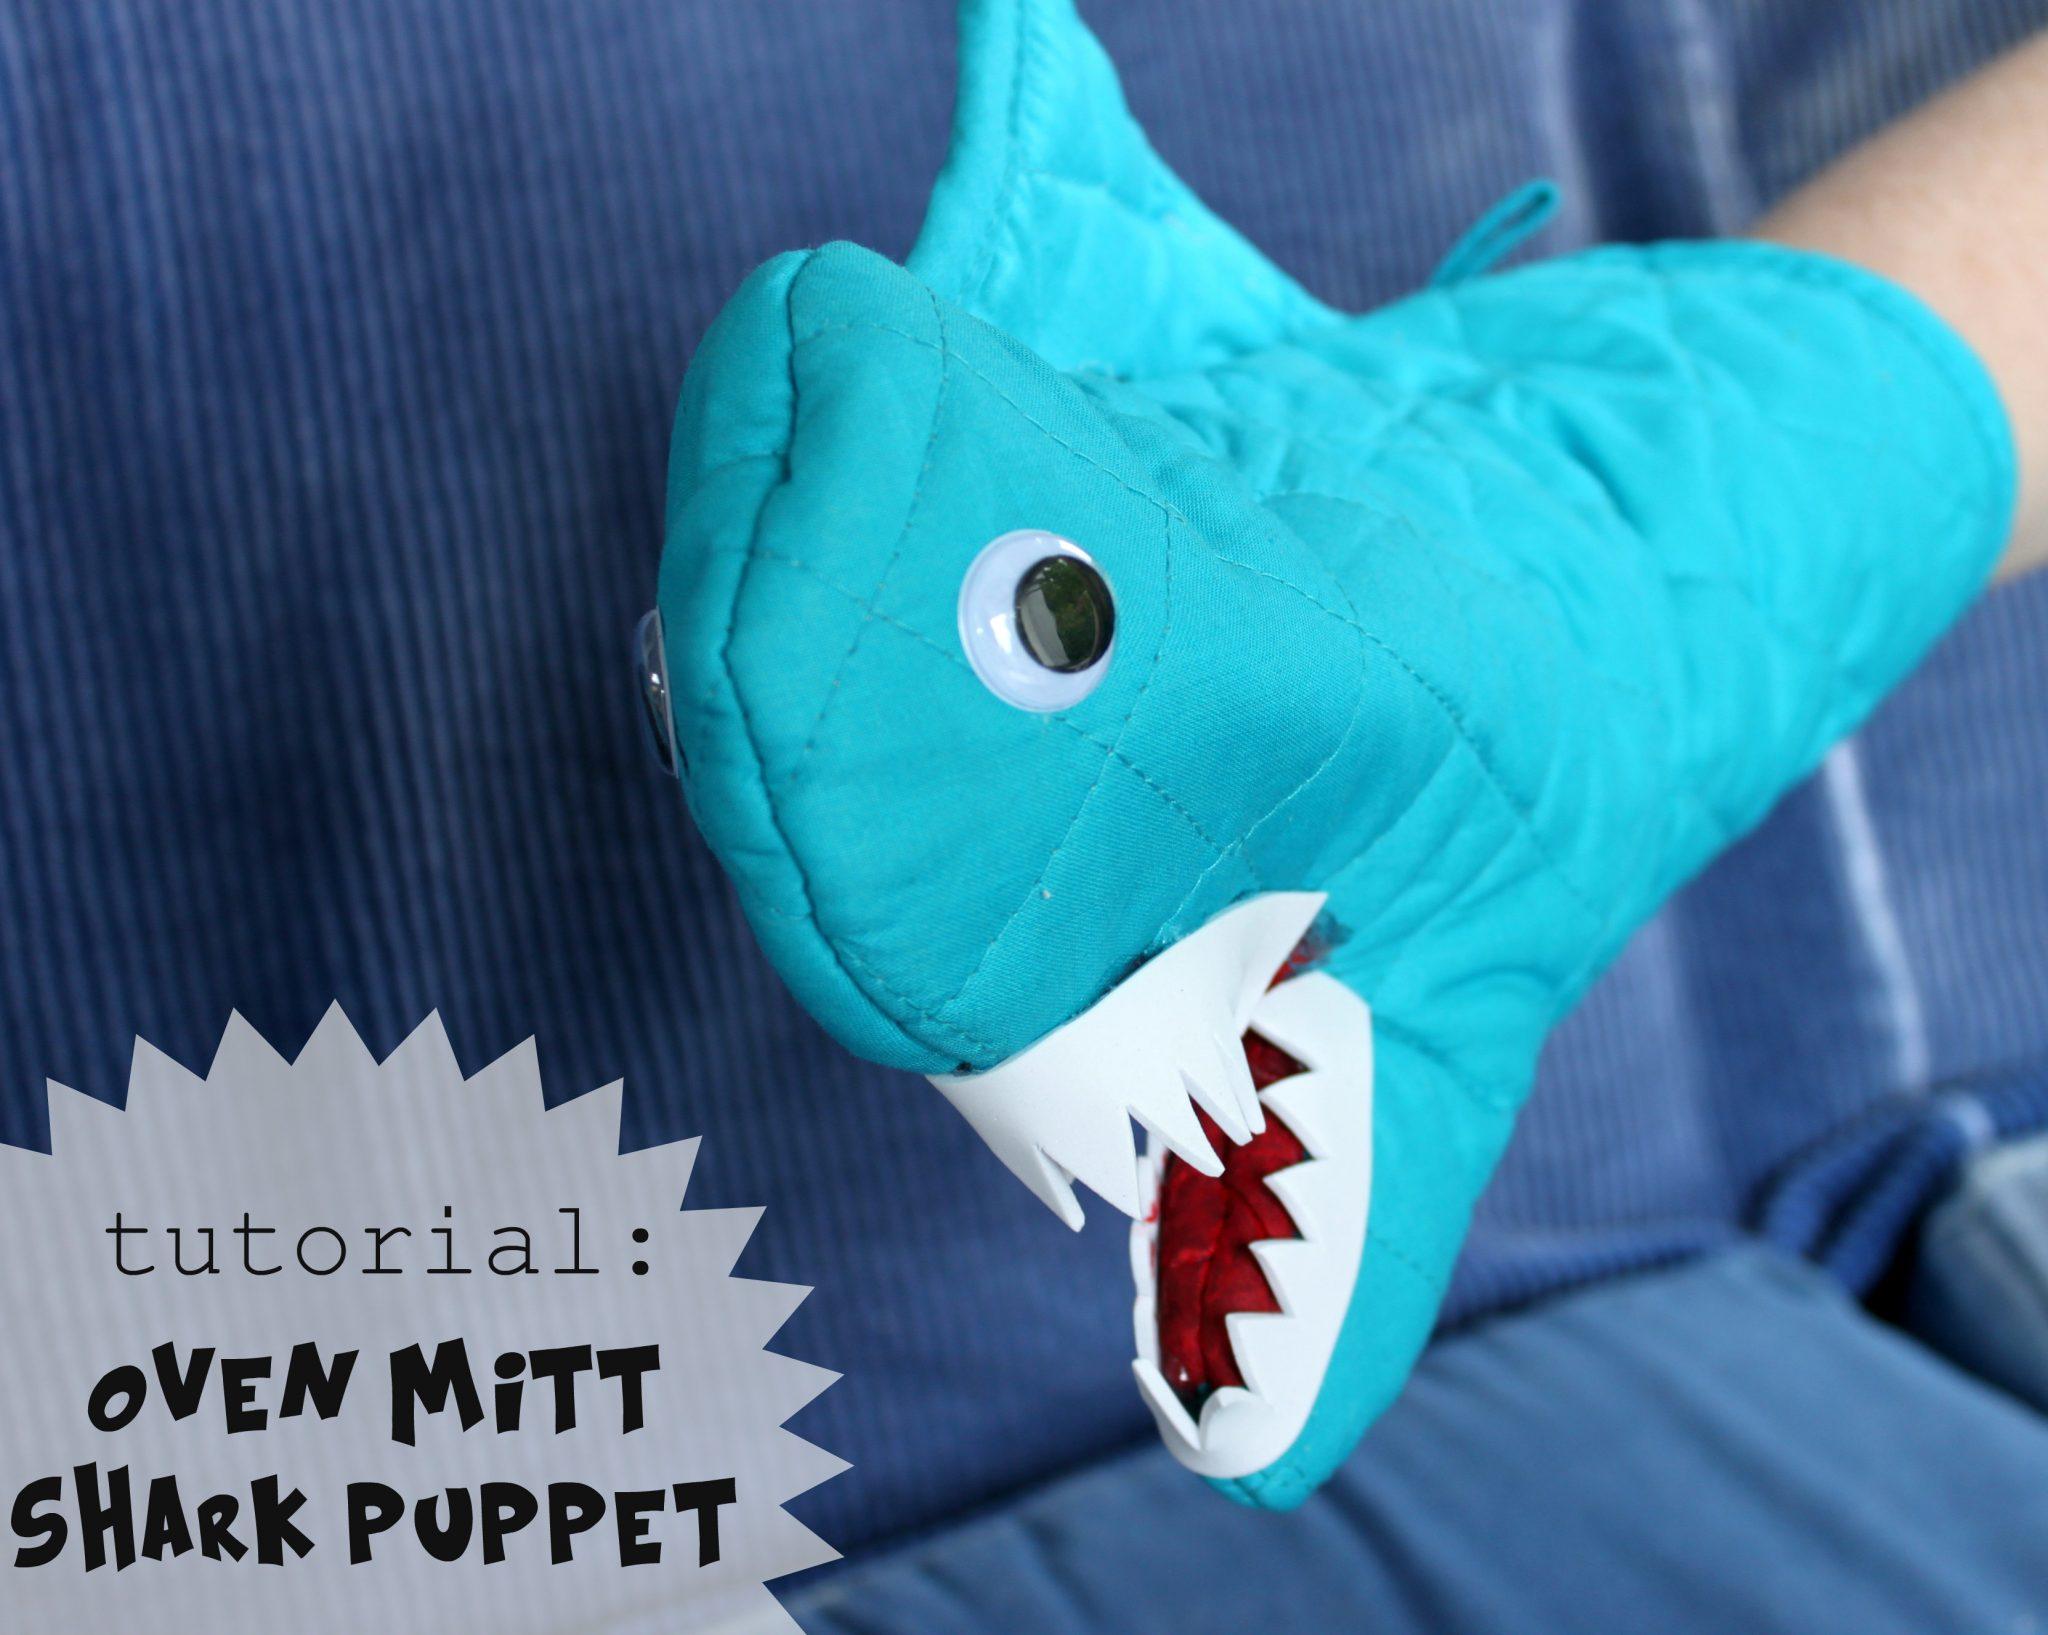 Tutorial Oven Mitt Shark Puppet Dollar Store Crafts